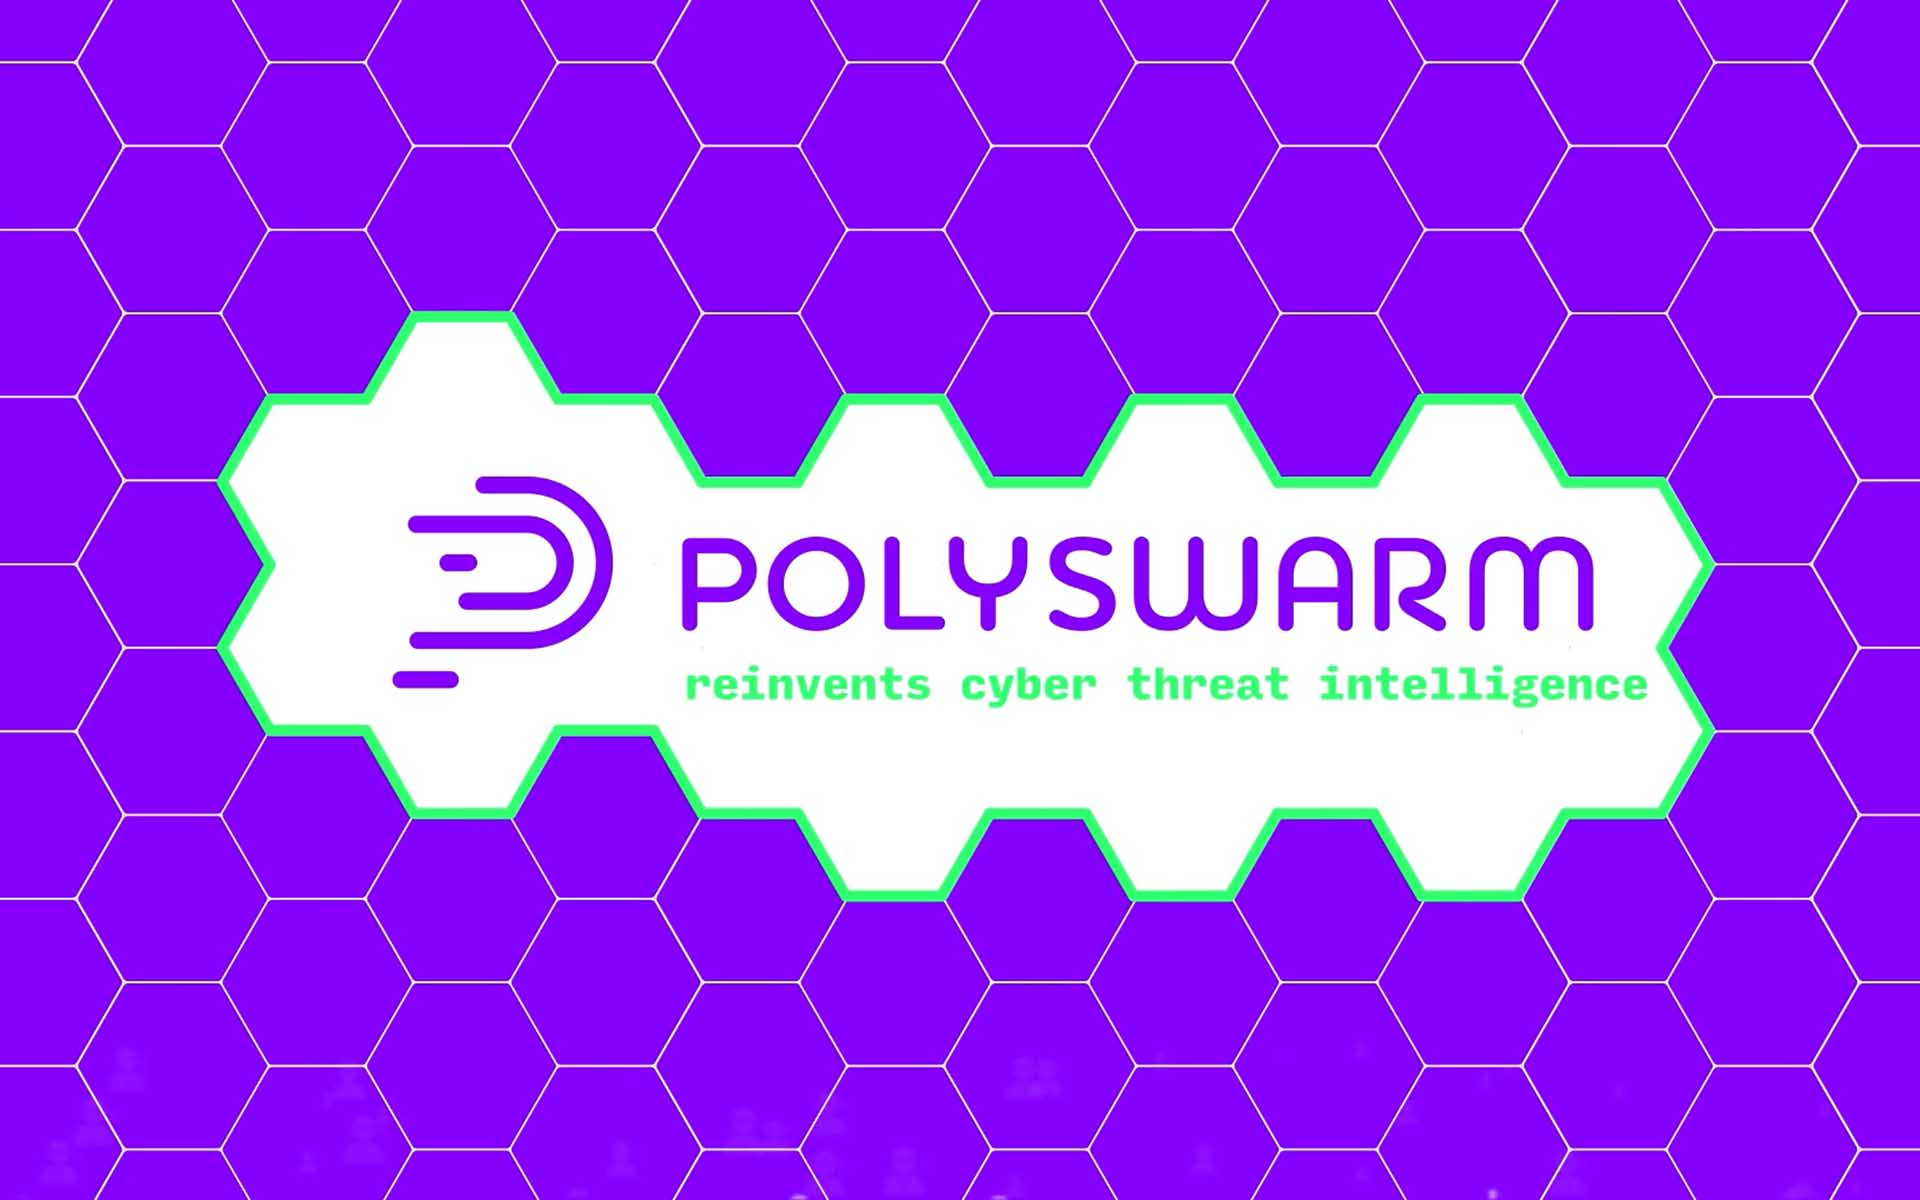 PolySwarm Raises $25.94 Million in Public Token Sale to Decentralize Cybersecurity